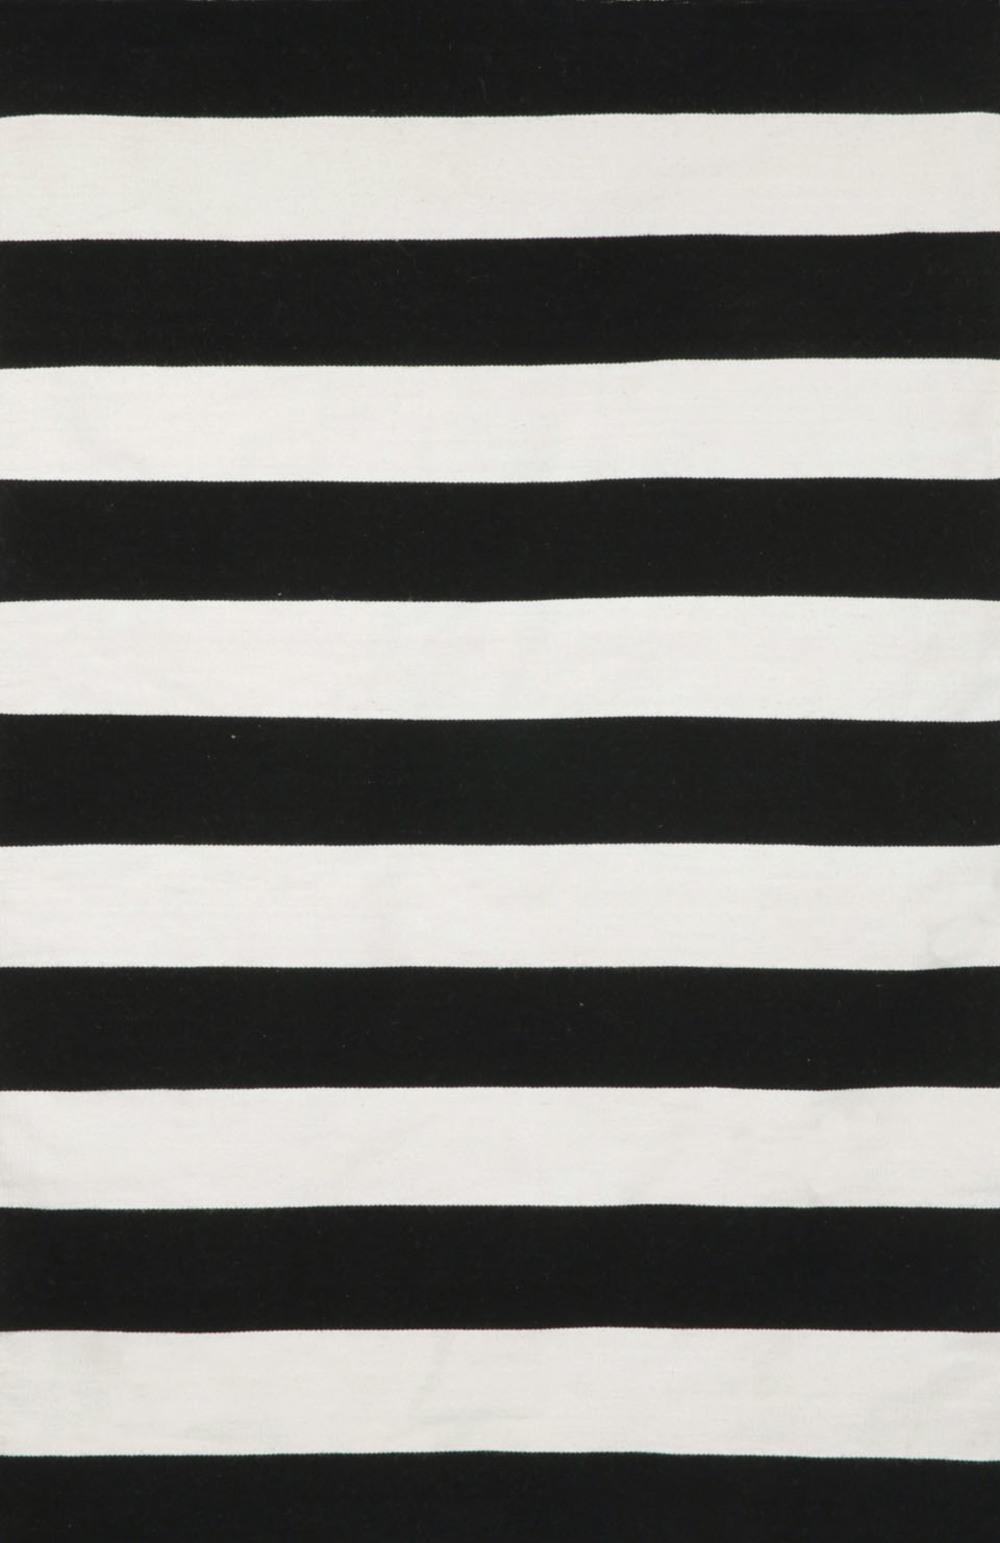 Trans-Ocean Import - Sorrento Rugby Stripe Black Rug, 5'x8'